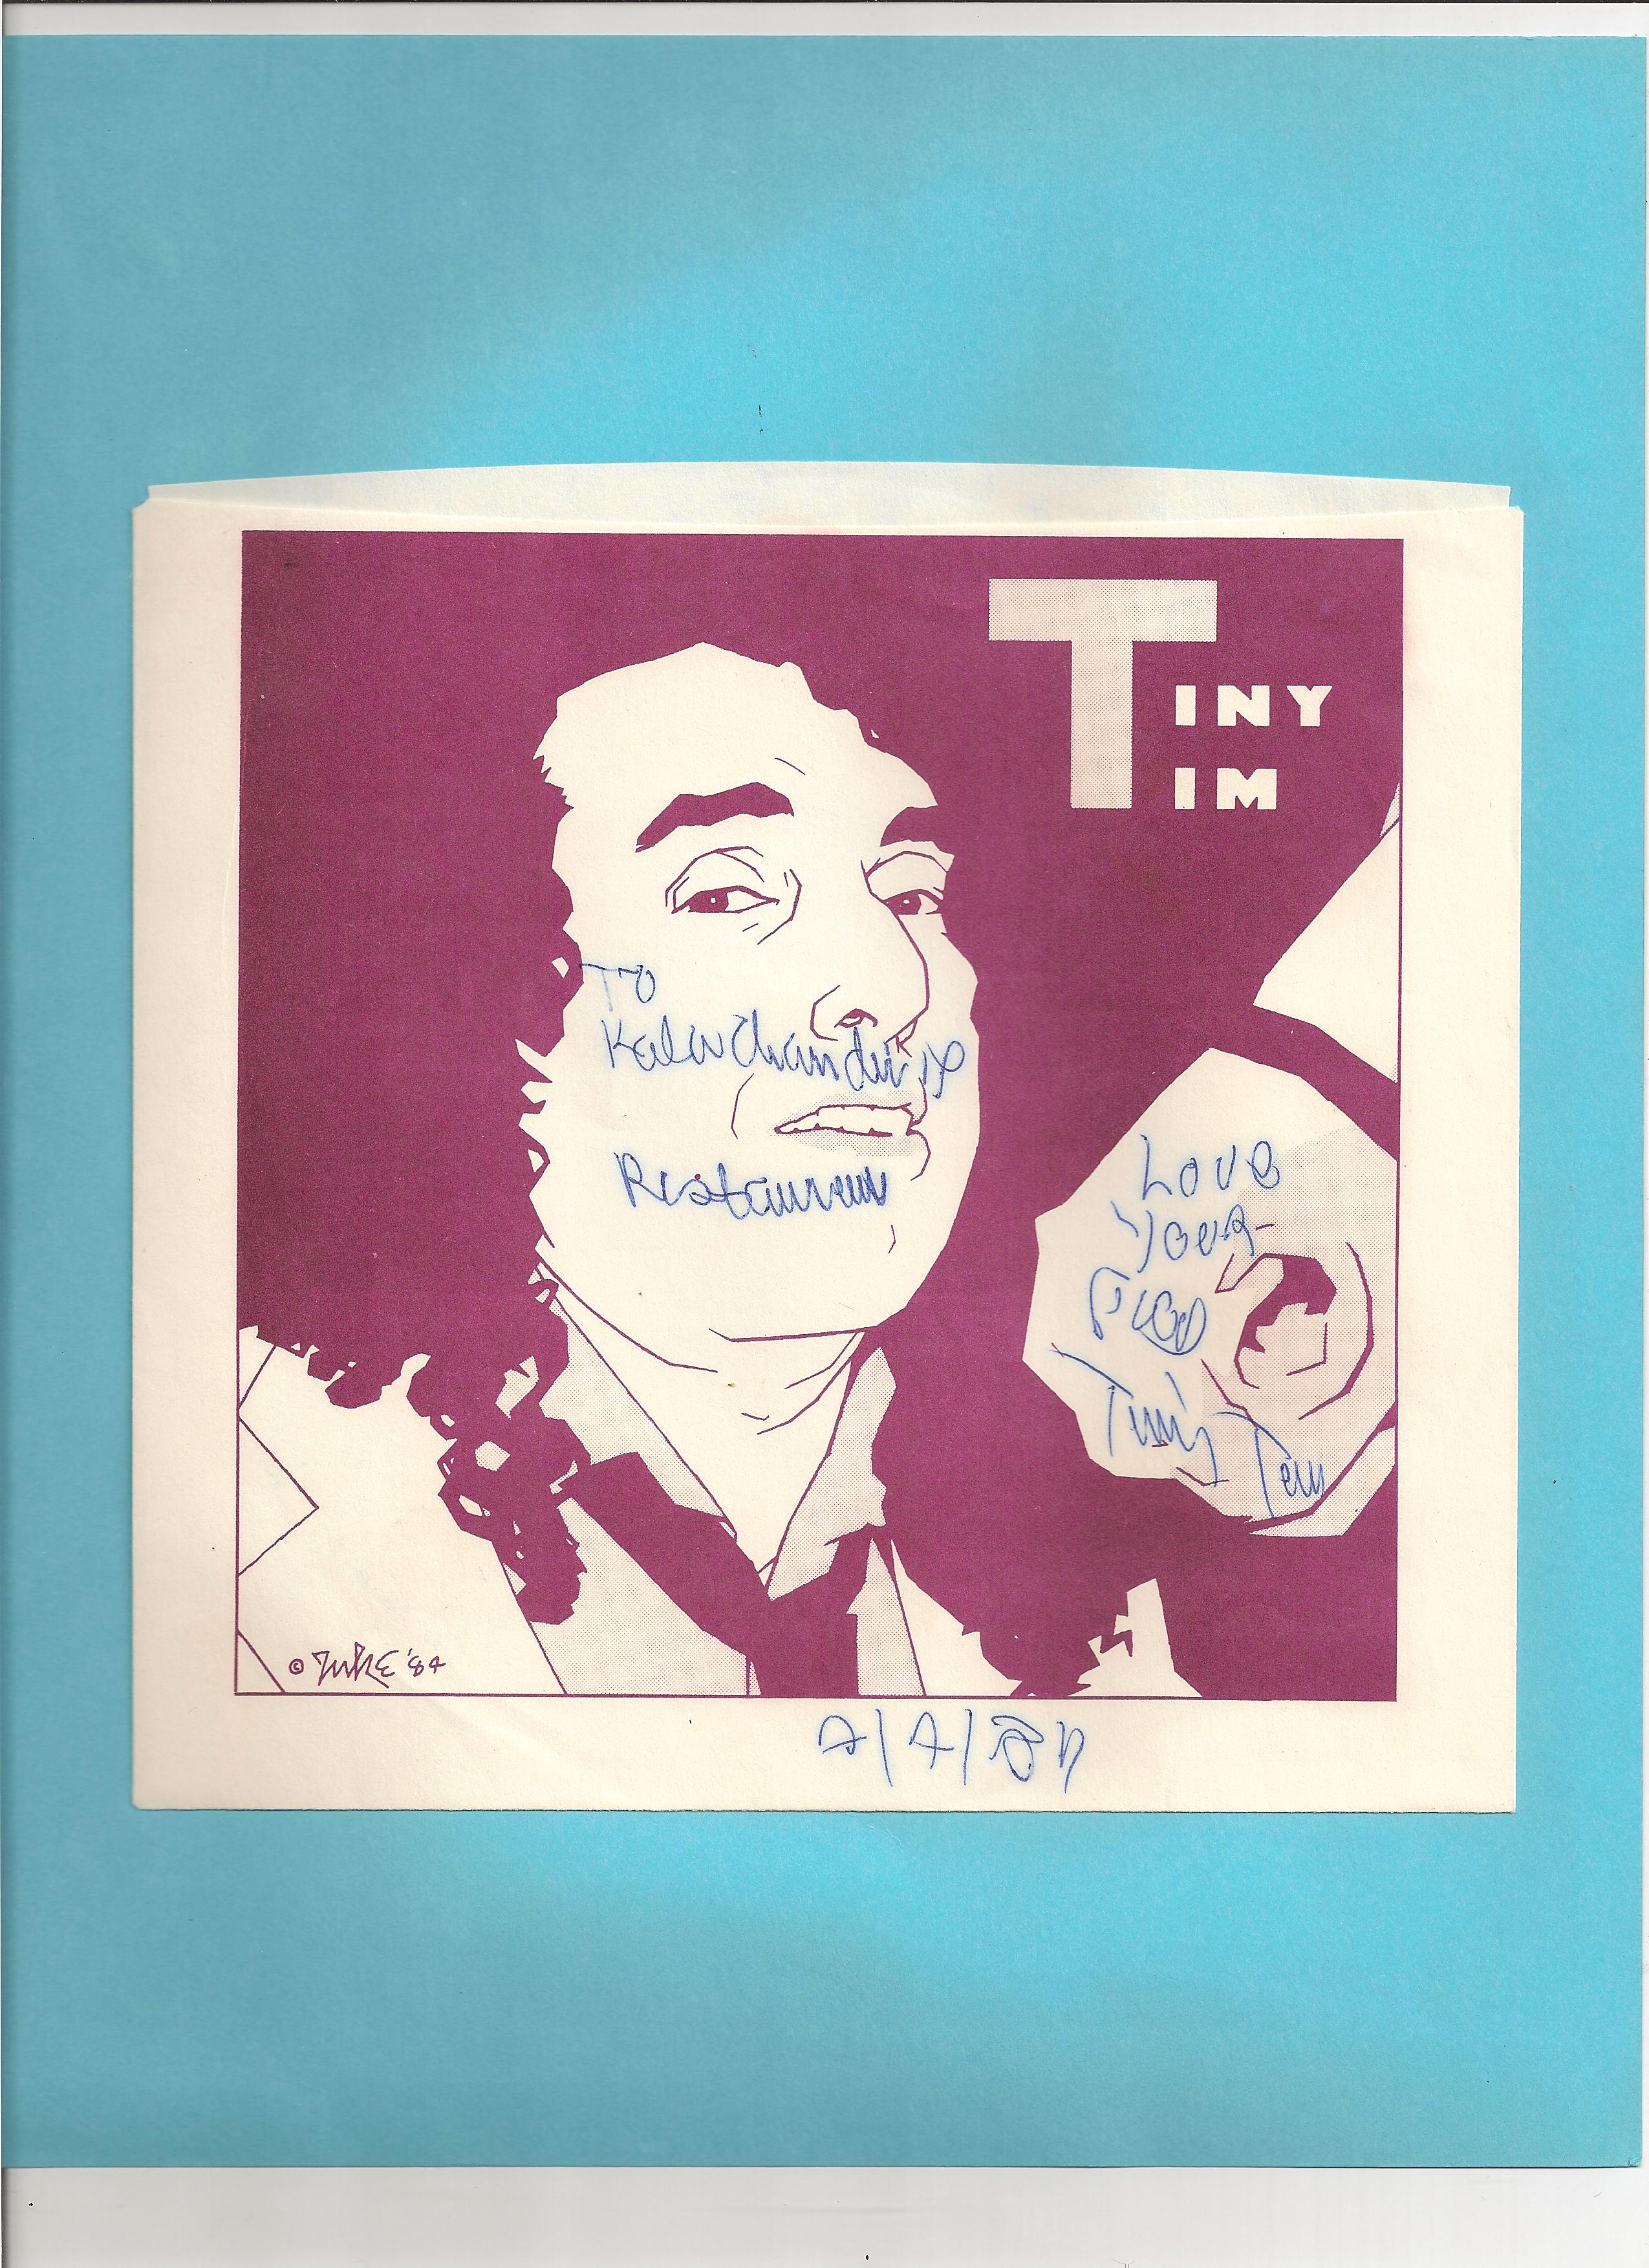 Tiny+Tim.jpeg